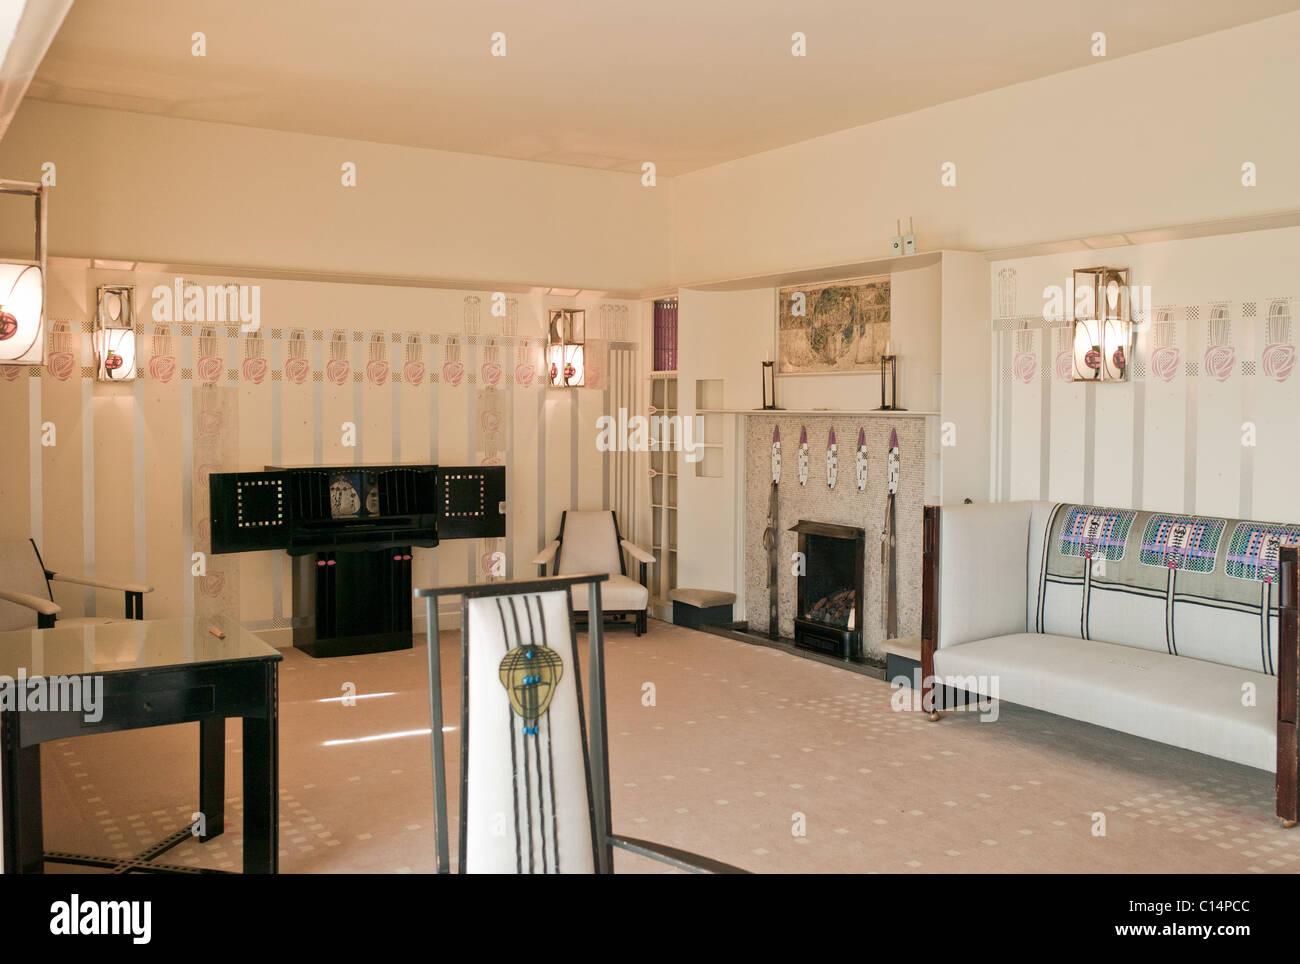 SITTING ROOM RENNIE MACKINTOSH HILL HOUSE GLASGOW SCOTLAND UNITED KINGDOM - Stock Image